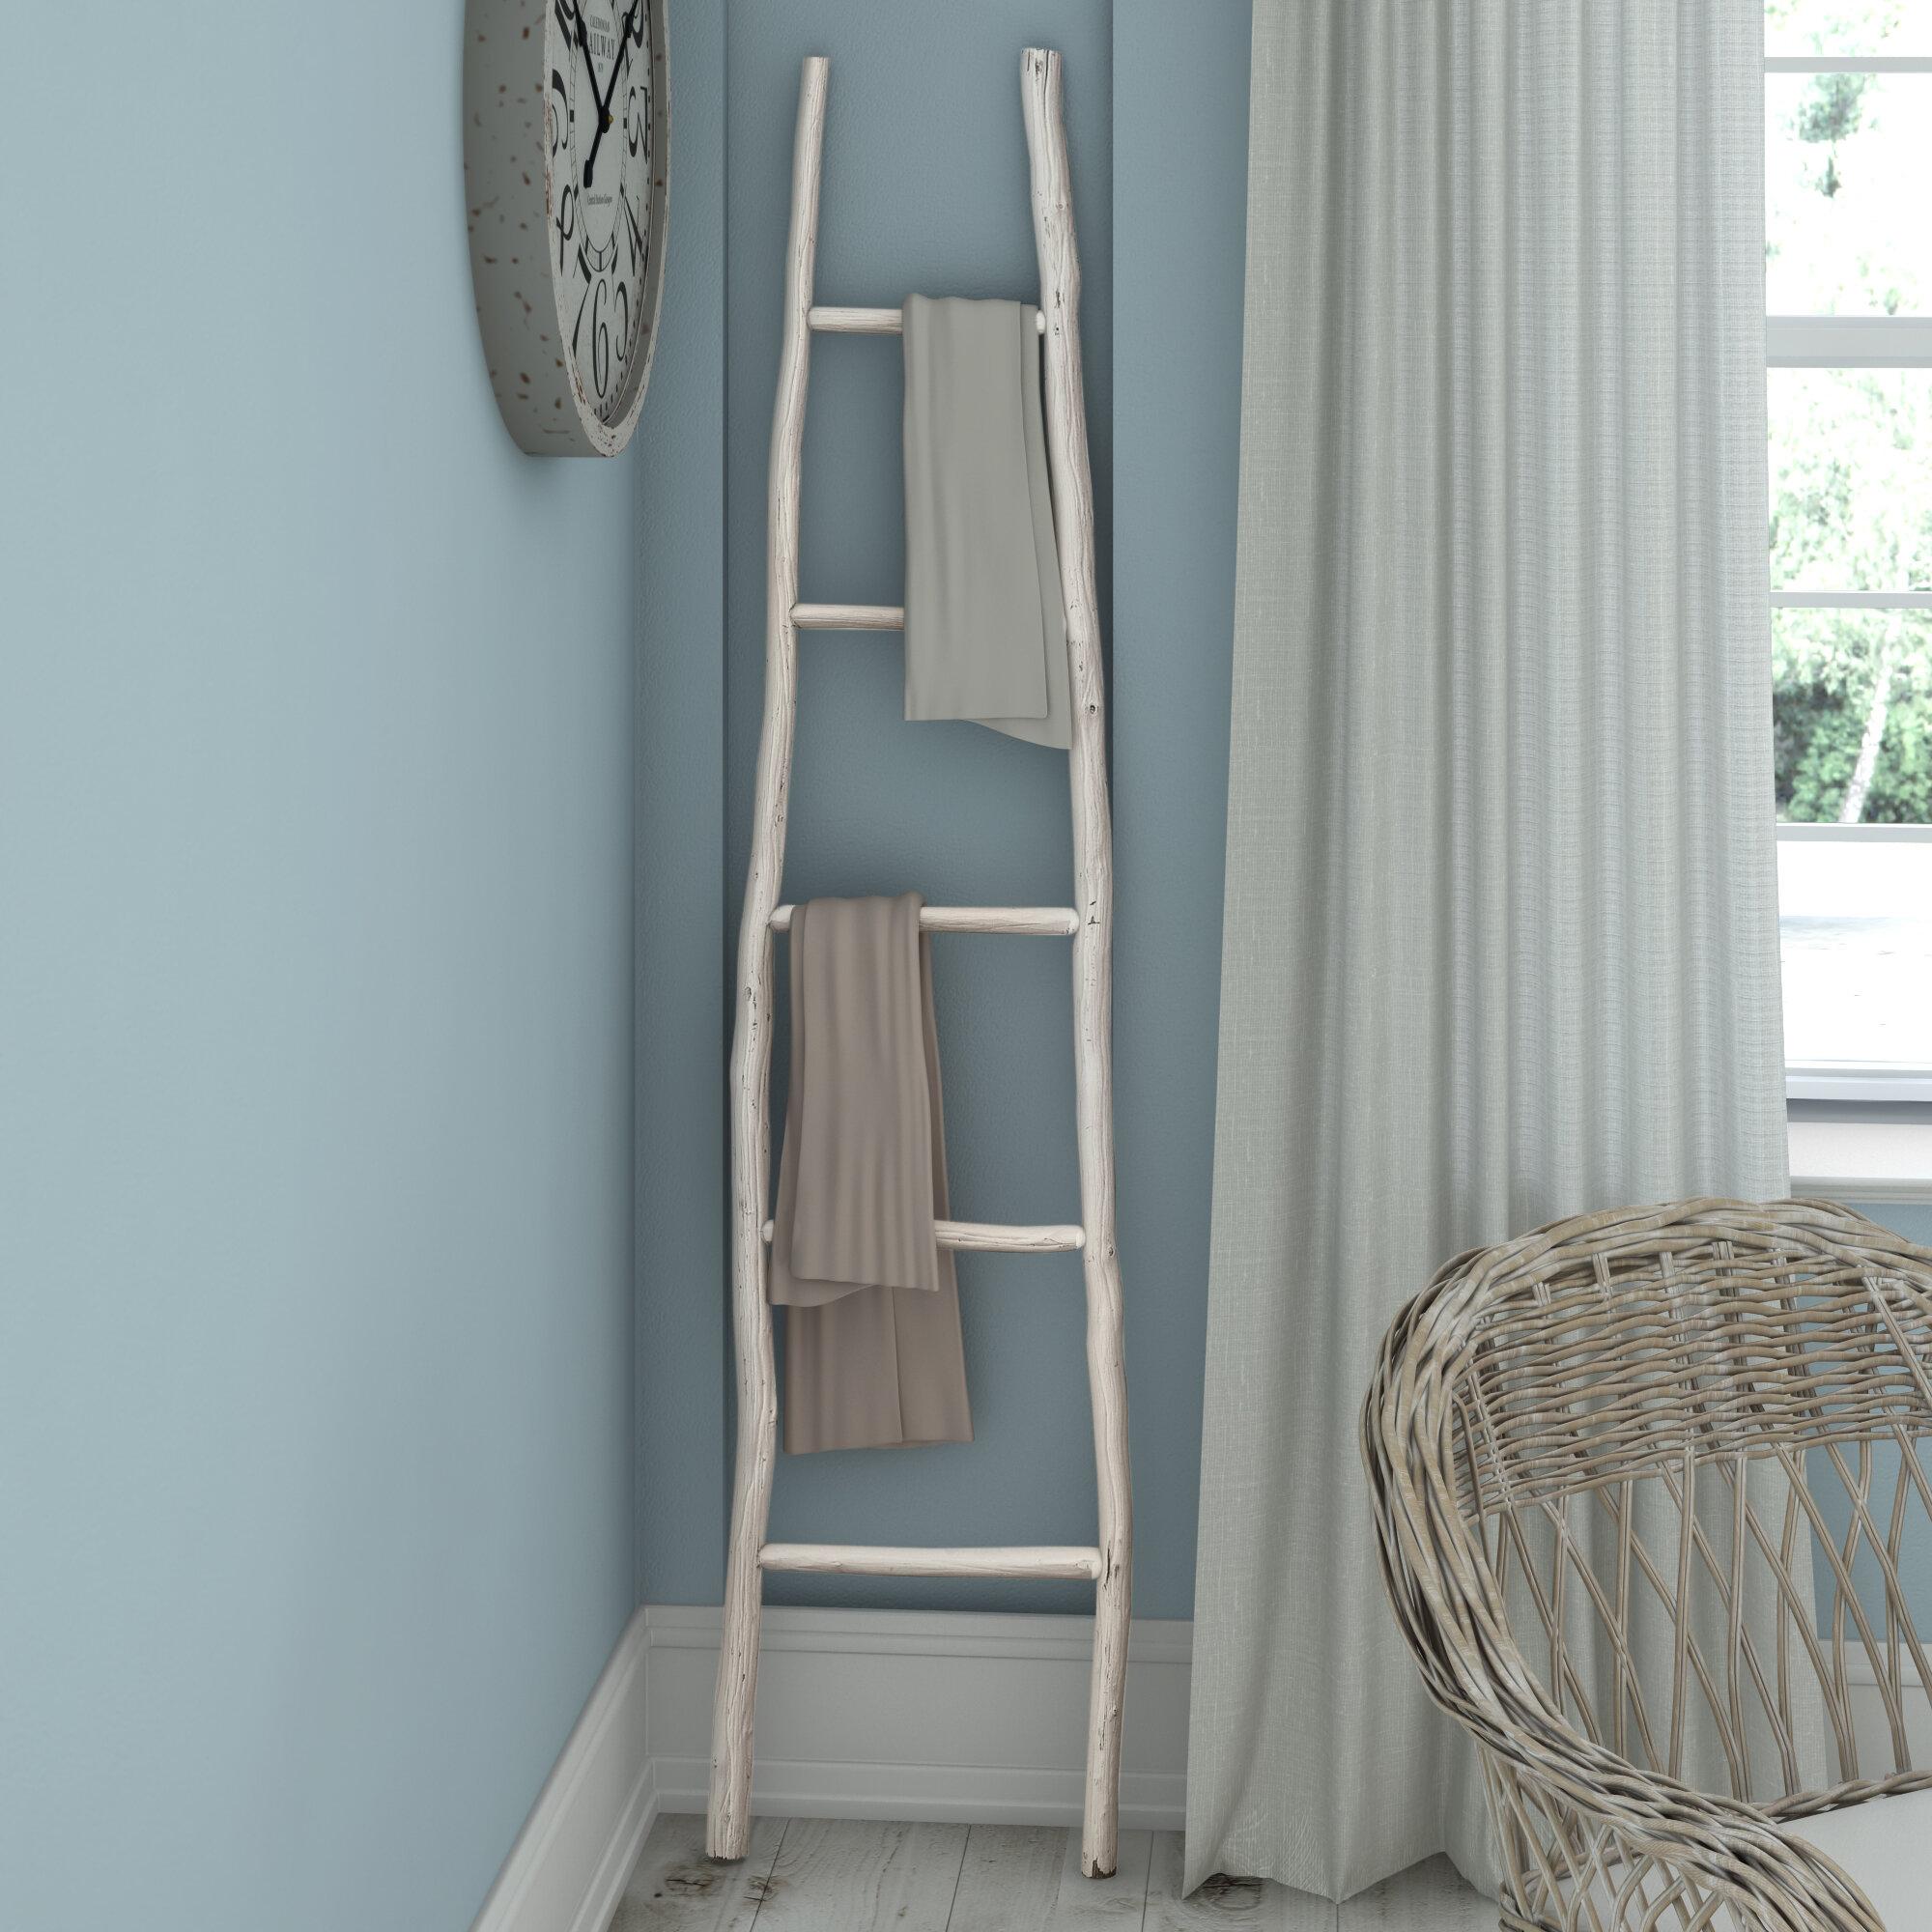 Beachcrest Home Painted Wood 6 ft Decorative Ladder & Reviews | Wayfair